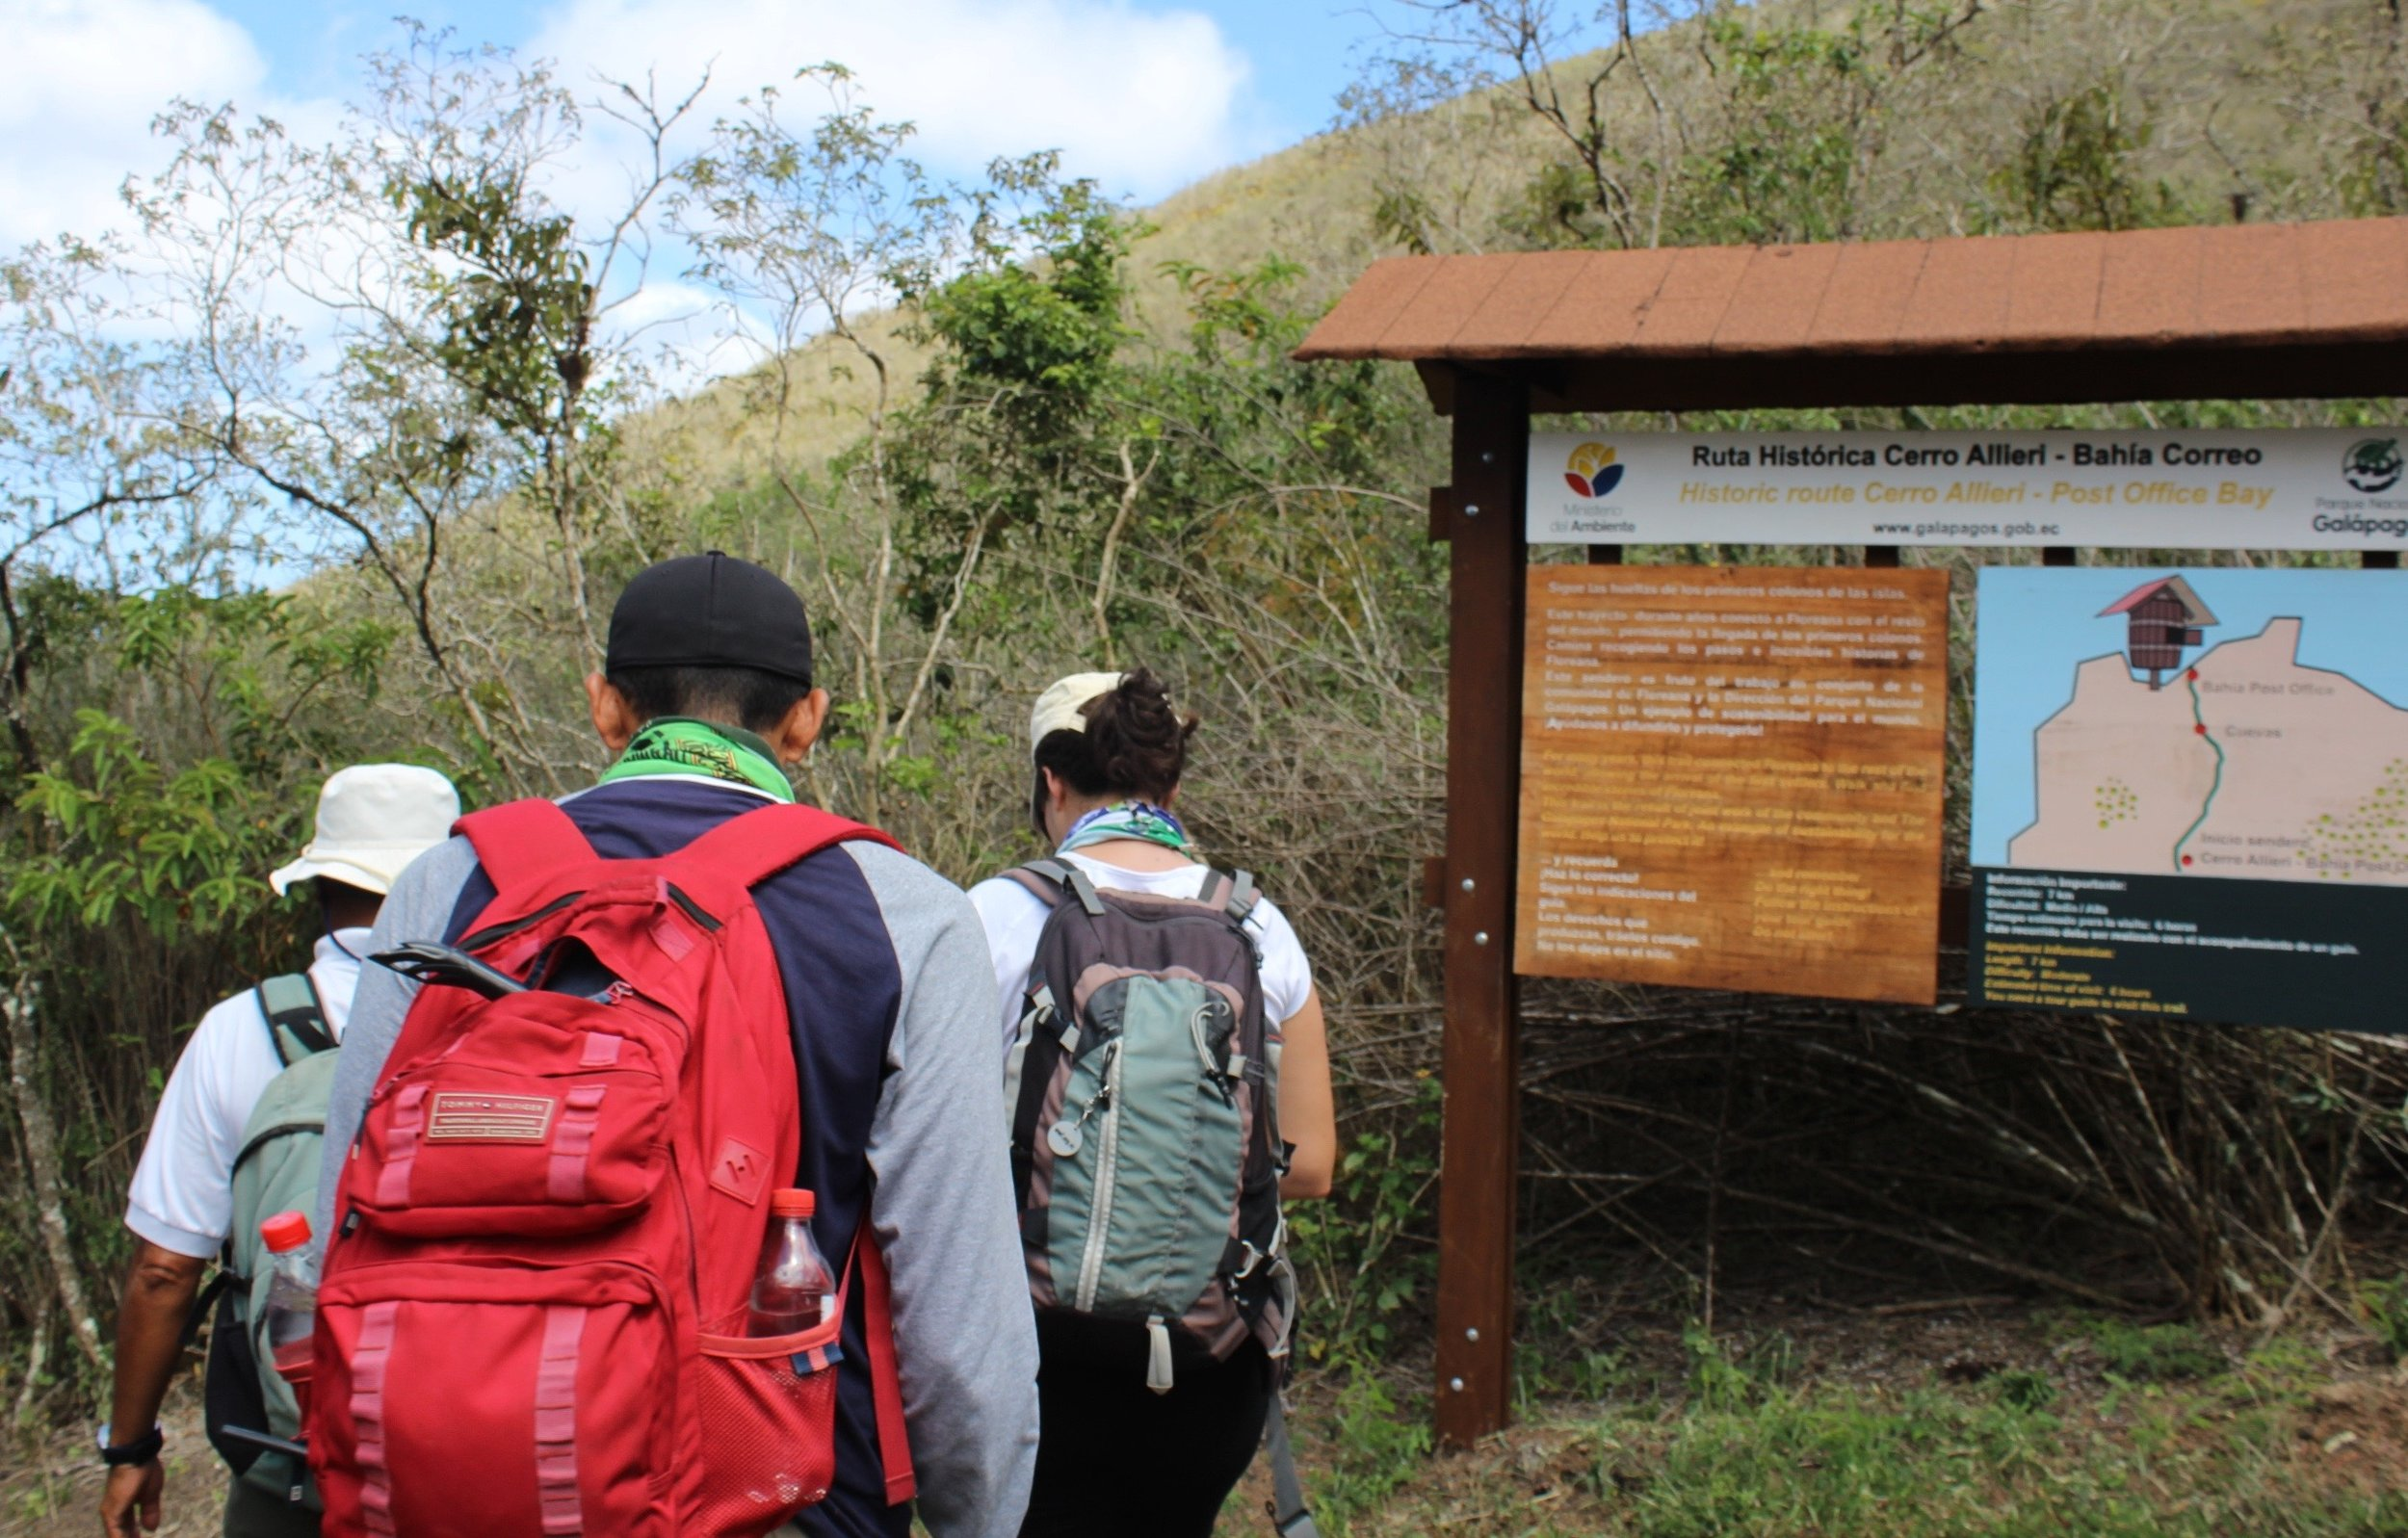 Figure 2 . Group of tourists entering a visitor site. Photo: WWF-Ecuador